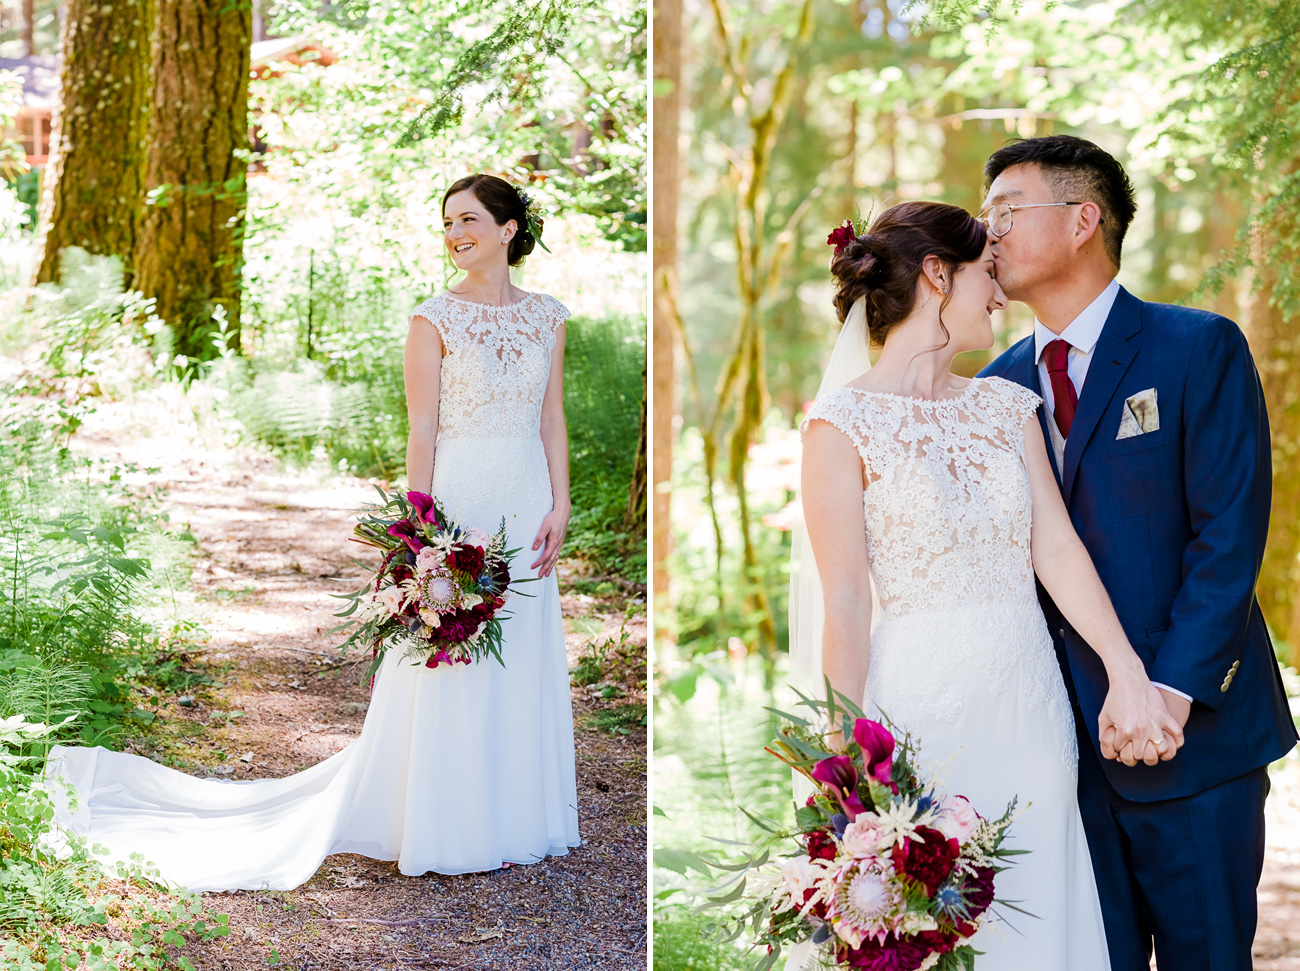 loloma-lodge-oregon-wedding-61 Loloma Lodge Oregon Wedding | Anna & Justin | Traditional Korean Tea Ceremony